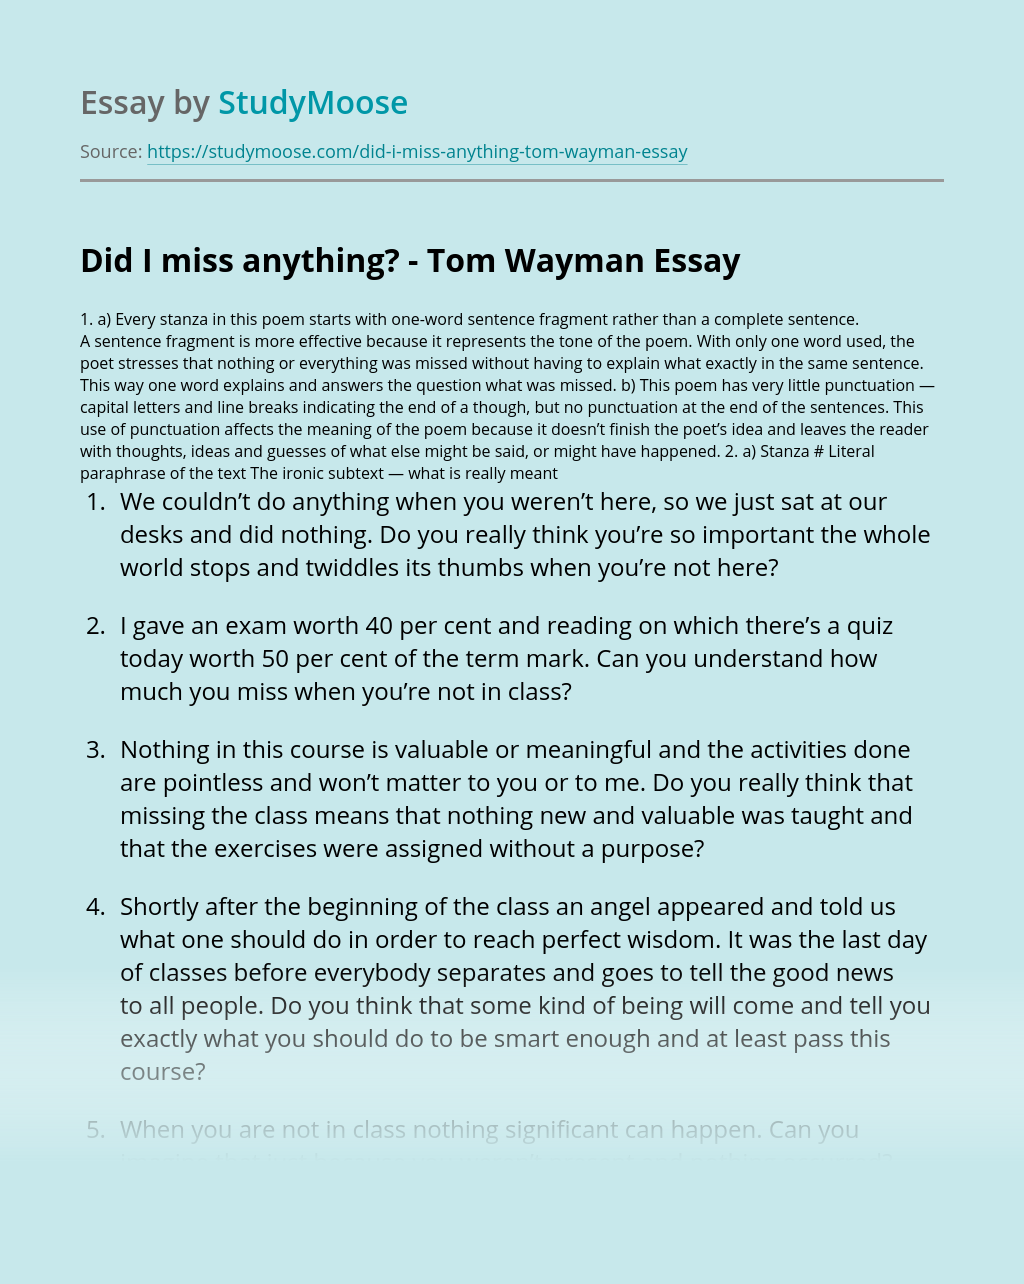 Did I miss anything? – Tom Wayman